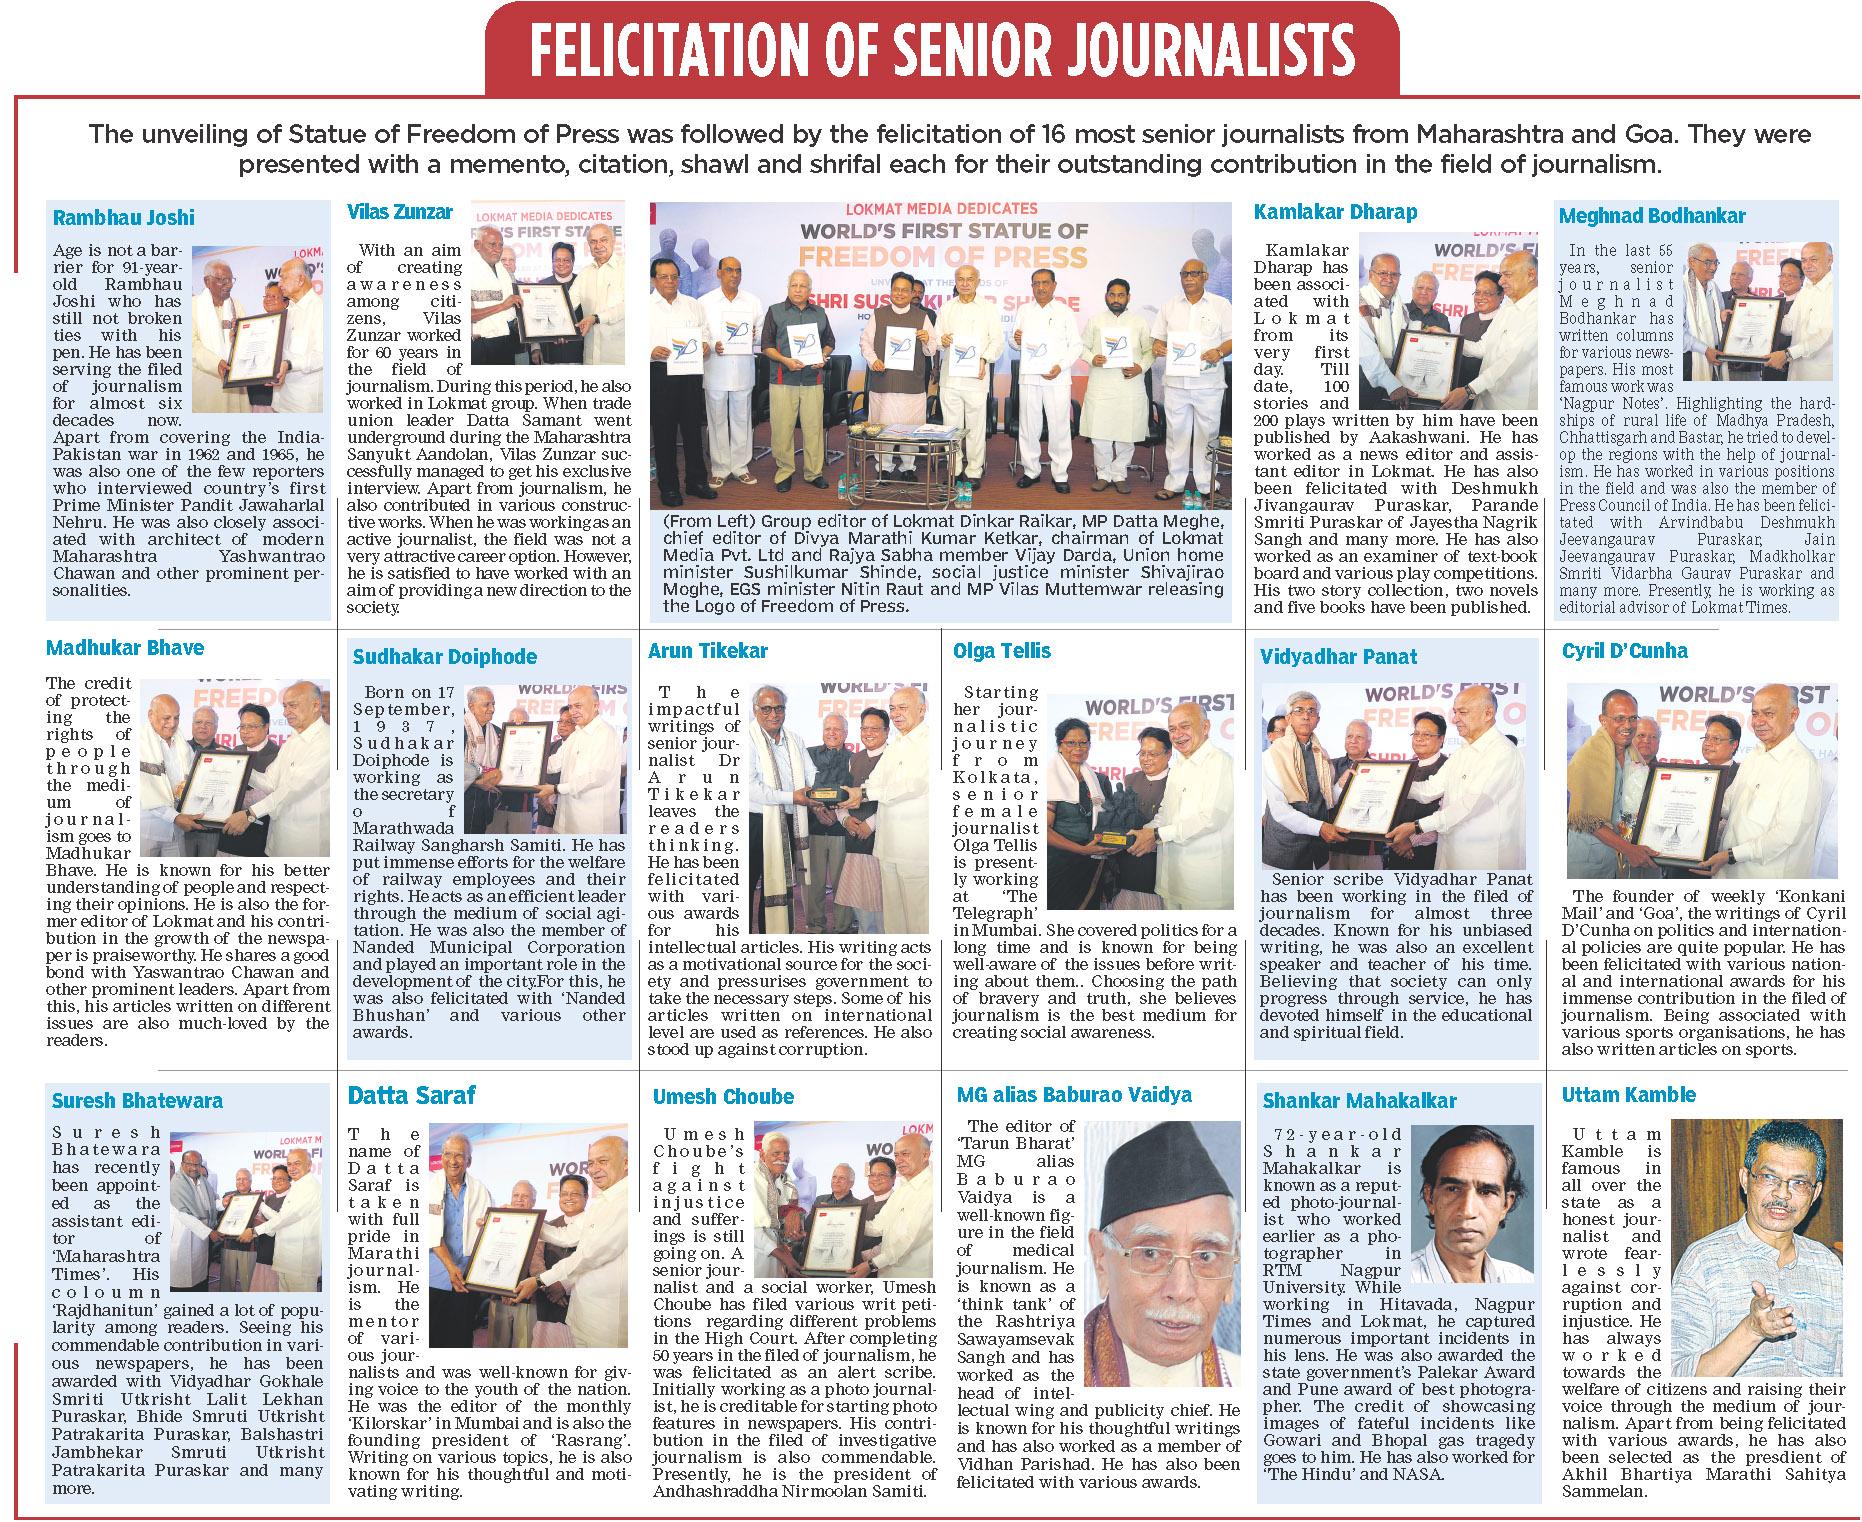 FELICITATION OF SENIOR JOURNALISTS